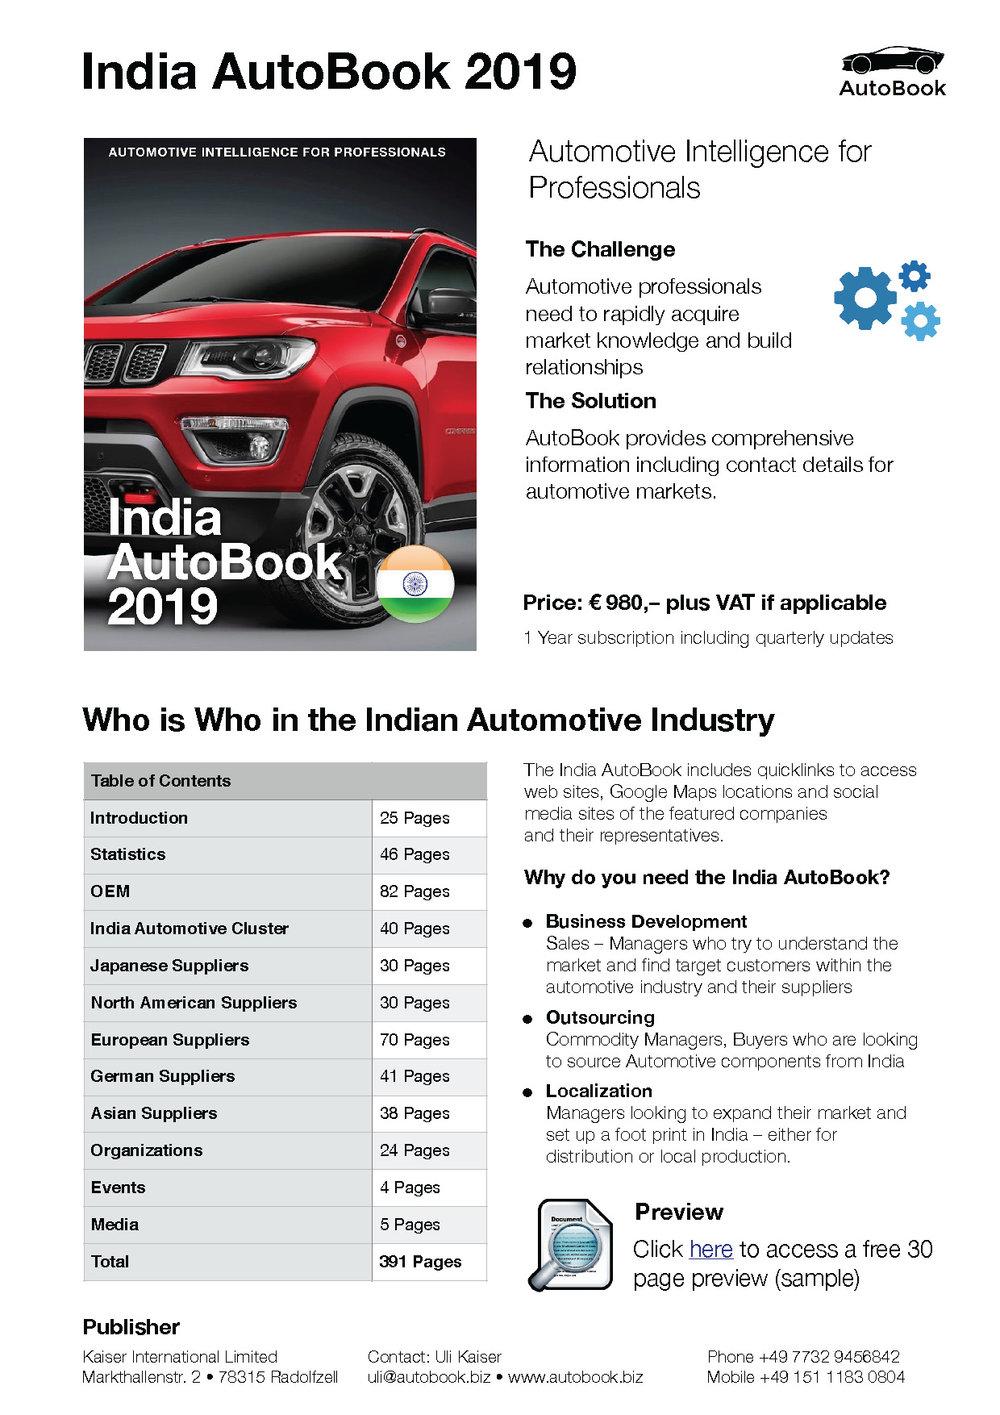 India AutoBook 2019 Datasheet.jpg